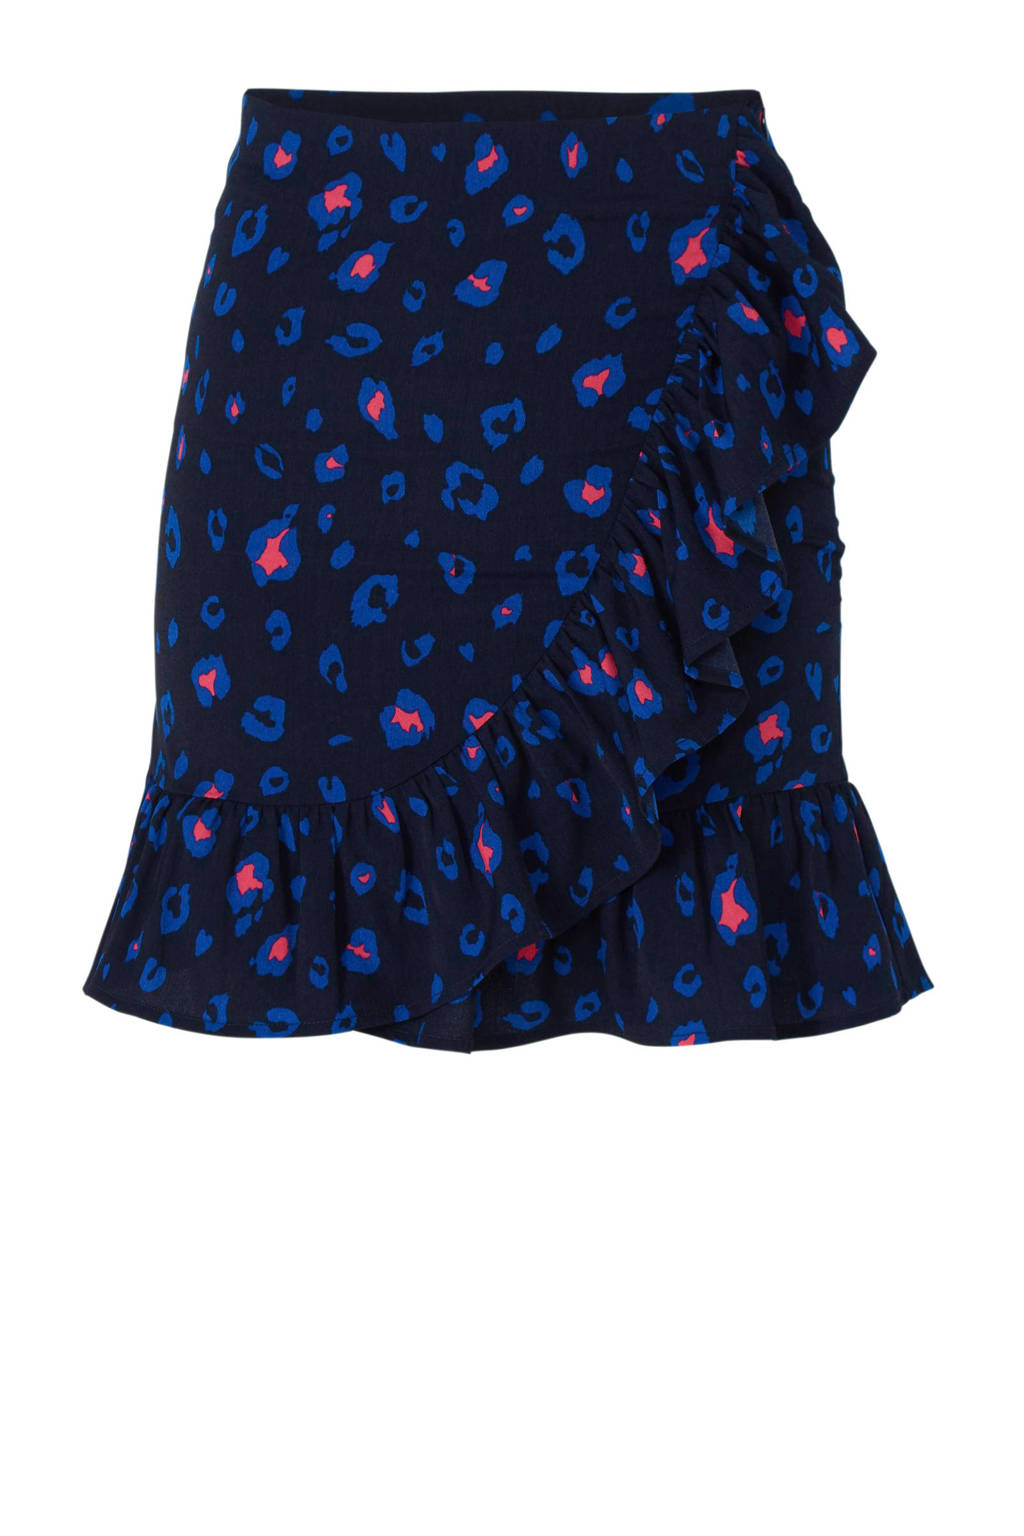 Colourful Rebel overslagrok met panterprint, Donkerblauw/roze